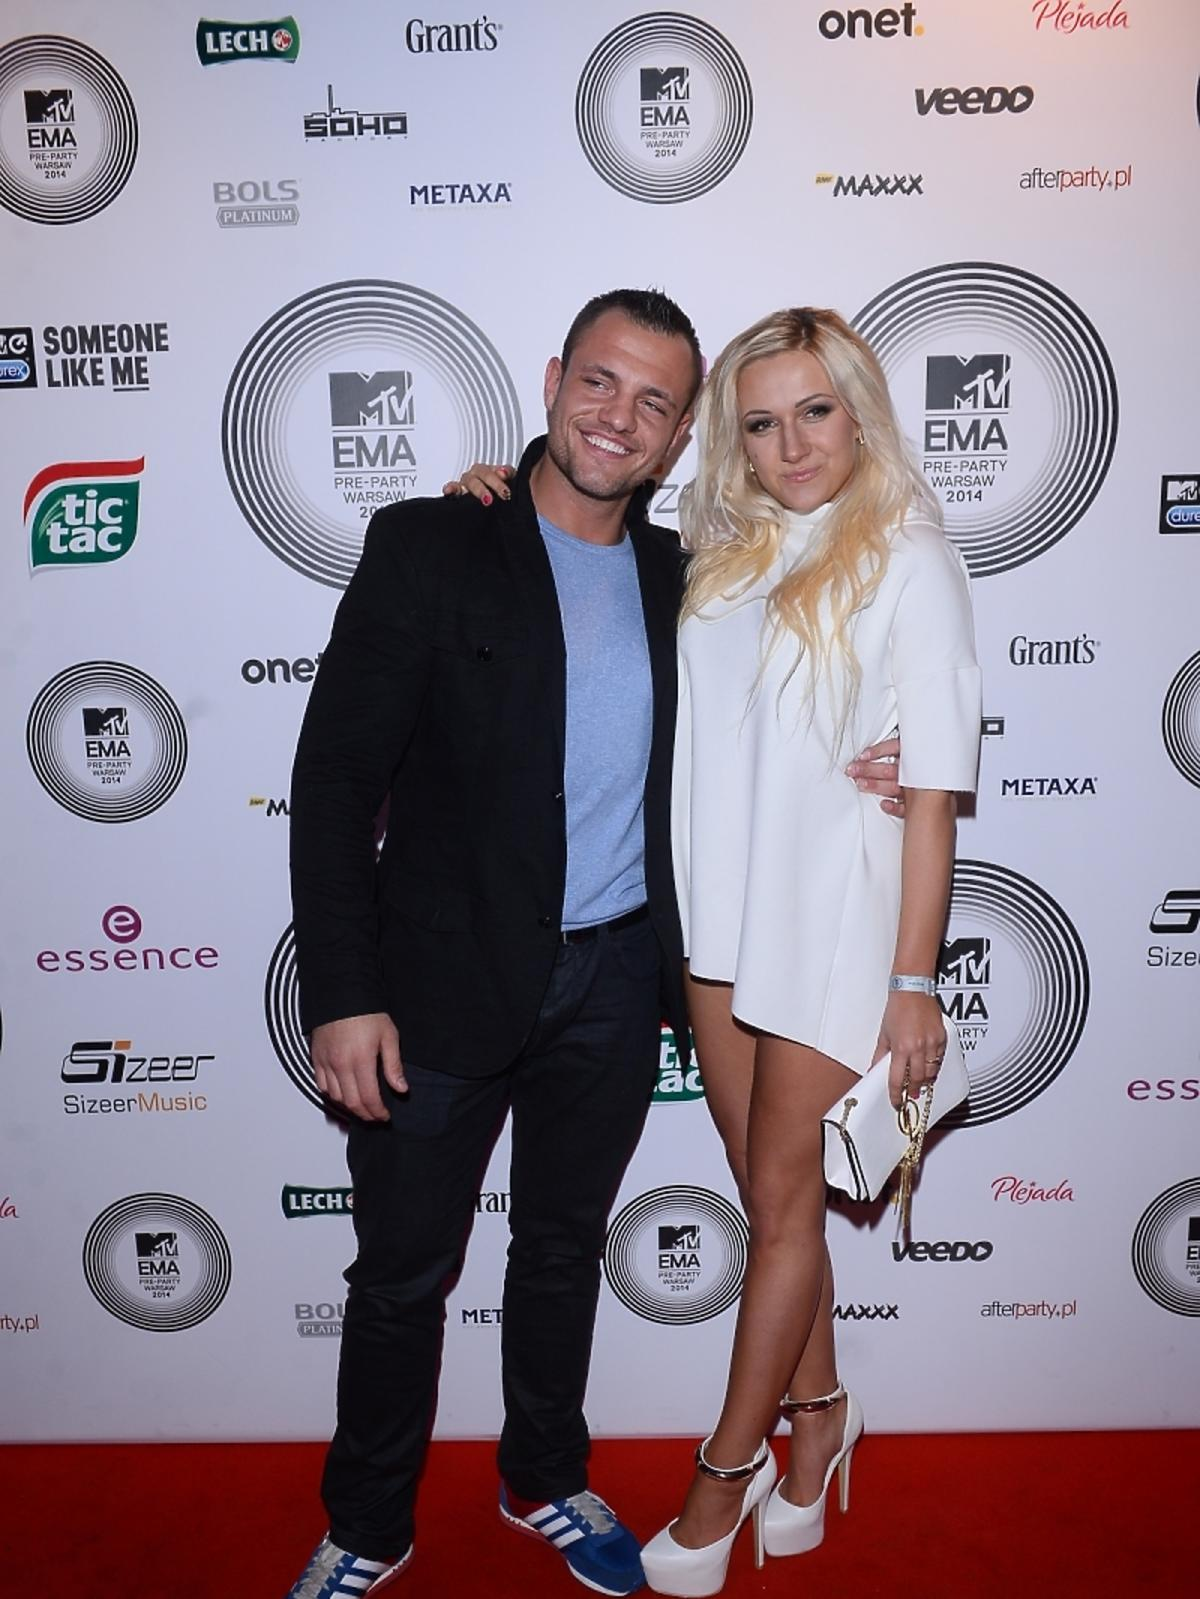 Eliza i Trybson z Warsaw Shore na MTV EMA 2014 PreParty